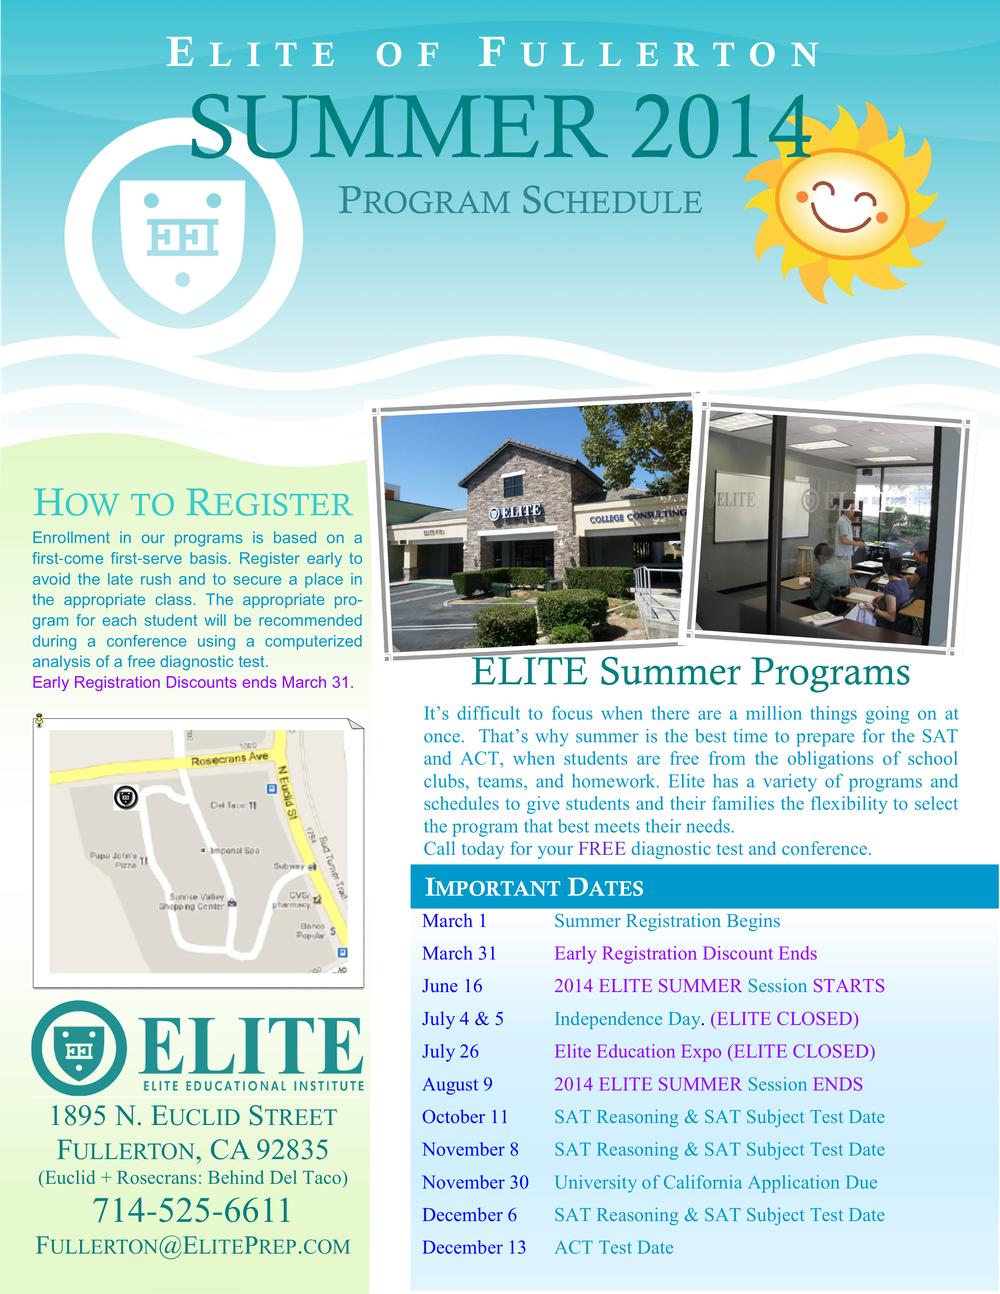 Summer 2014 Schedule (Click to download) »